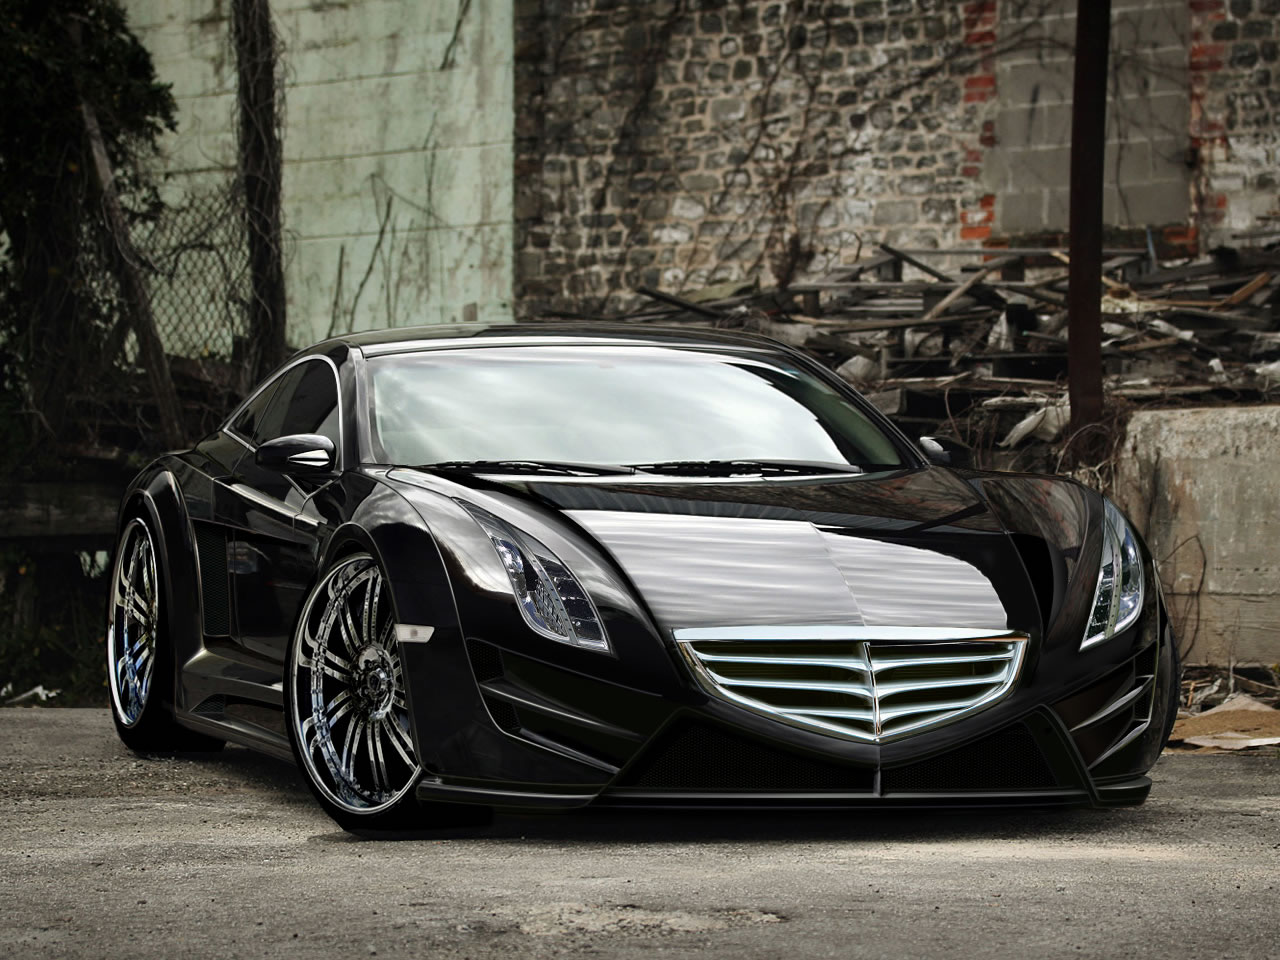 Black Car 32684 1280x960px